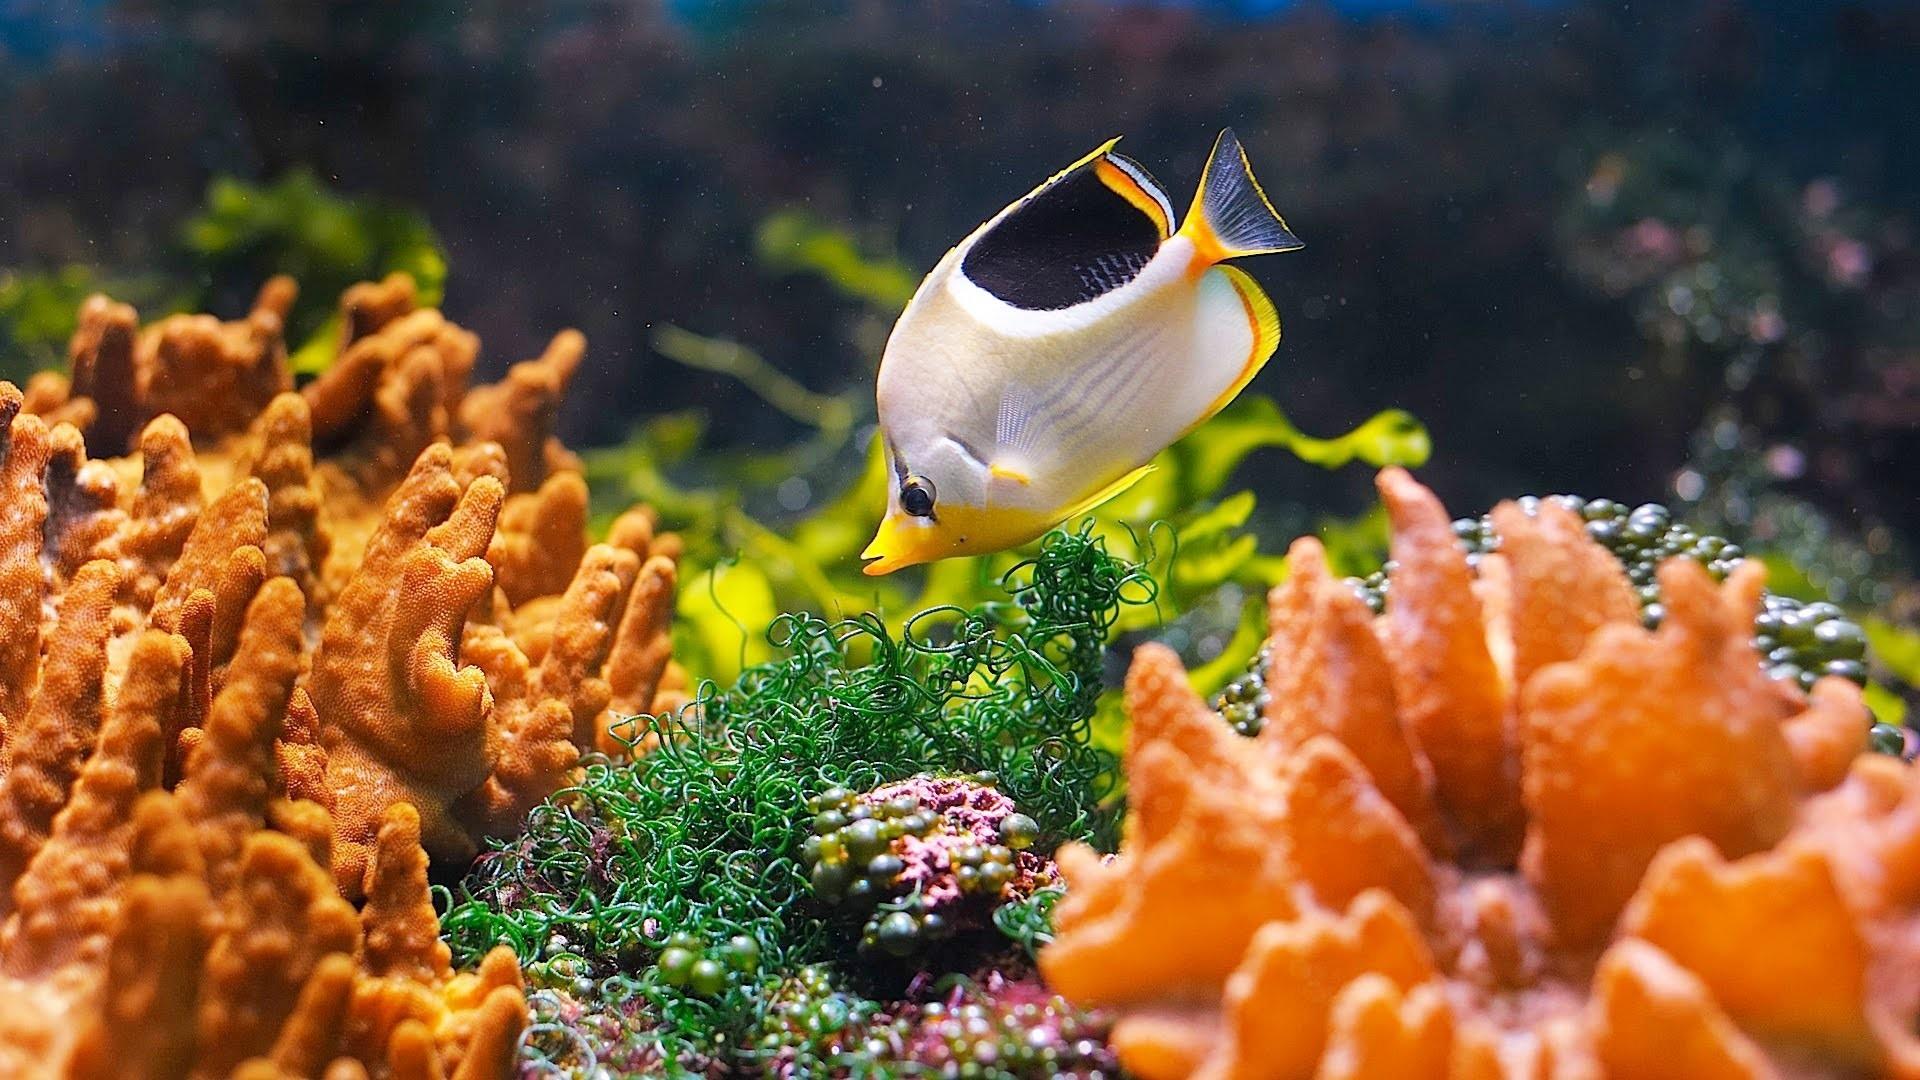 Saltwater Fish Wallpaper (58+ images)